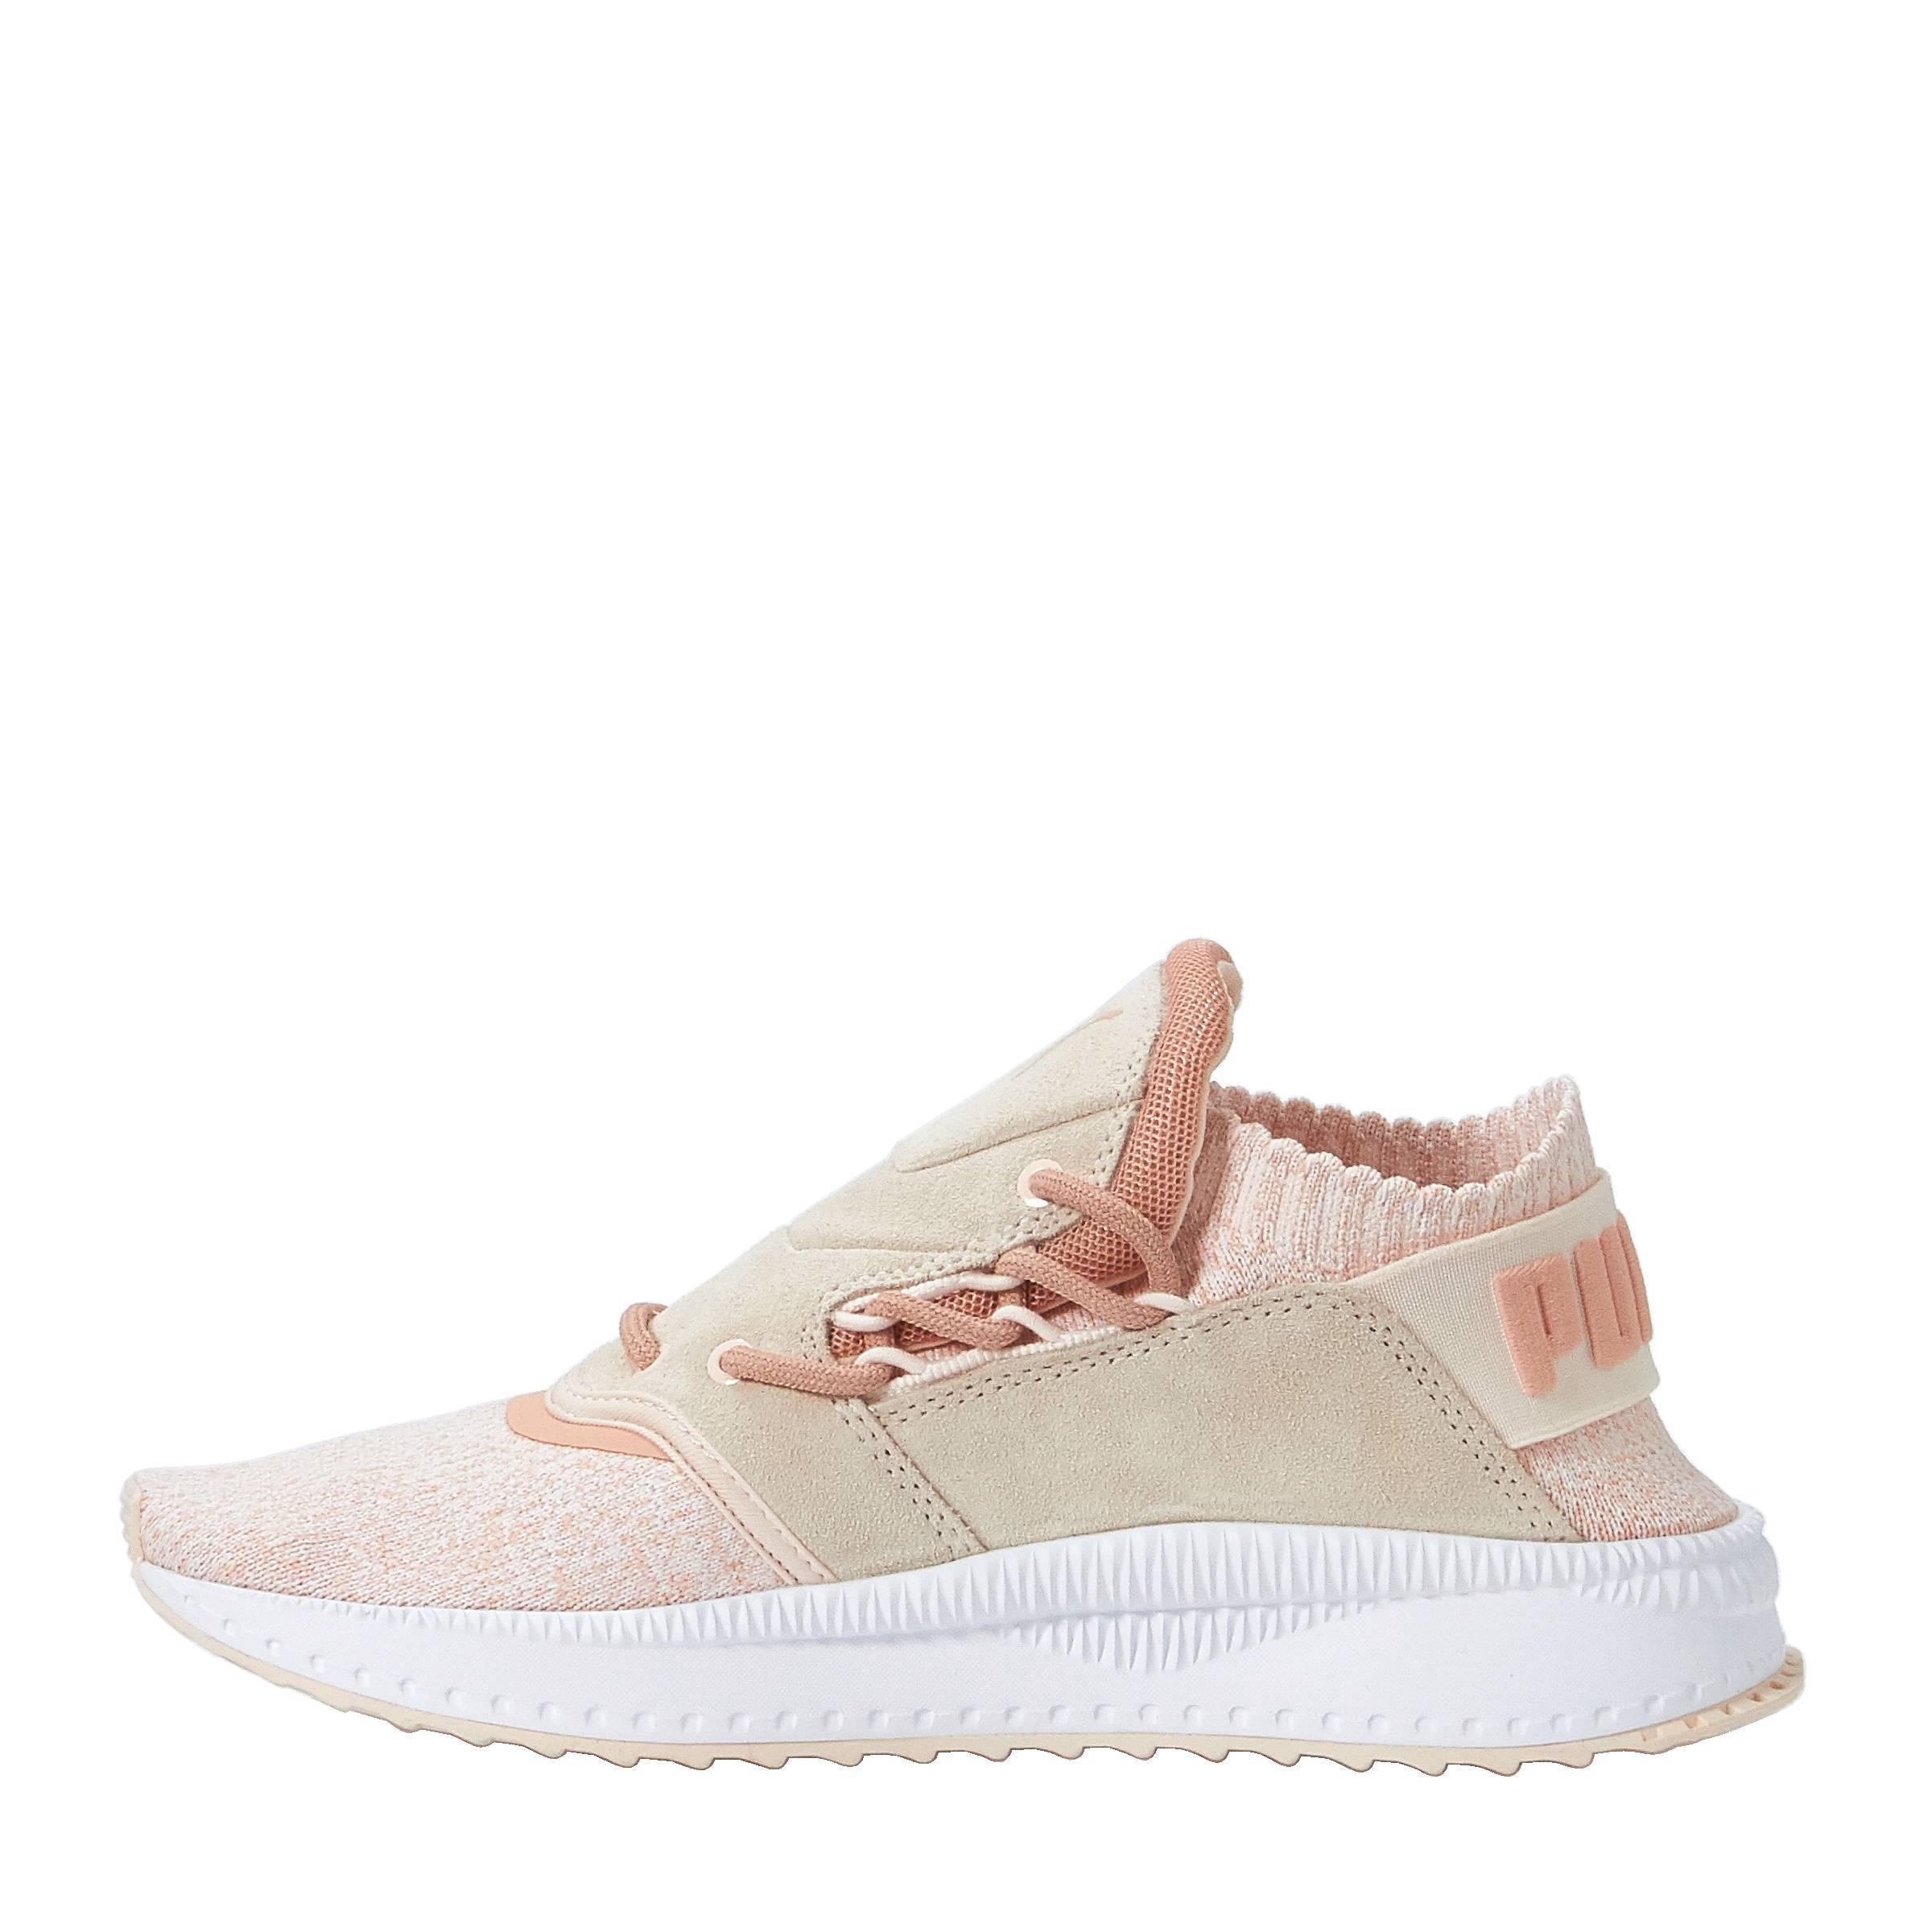 8c698f6517e Shinsei Evoknit Sneakers Wehkamp Tsugi Puma xfw5qapY